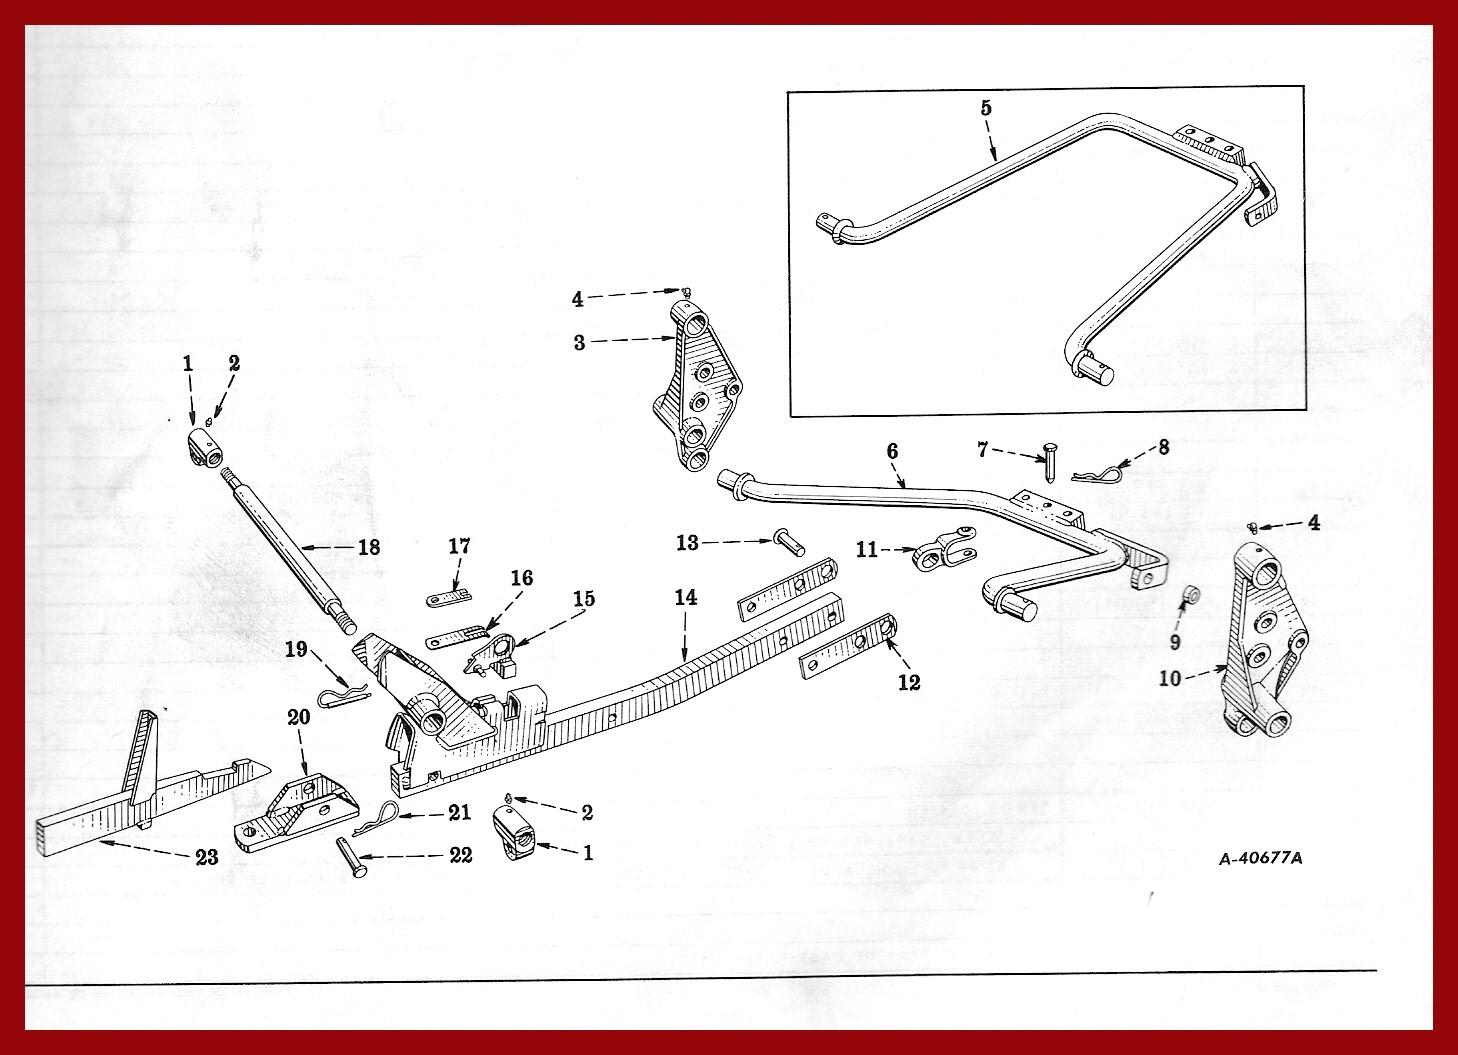 hight resolution of farmall cub parts diagram woods loader parts diagram farmall cub carburetor diagram farmall cub wiring